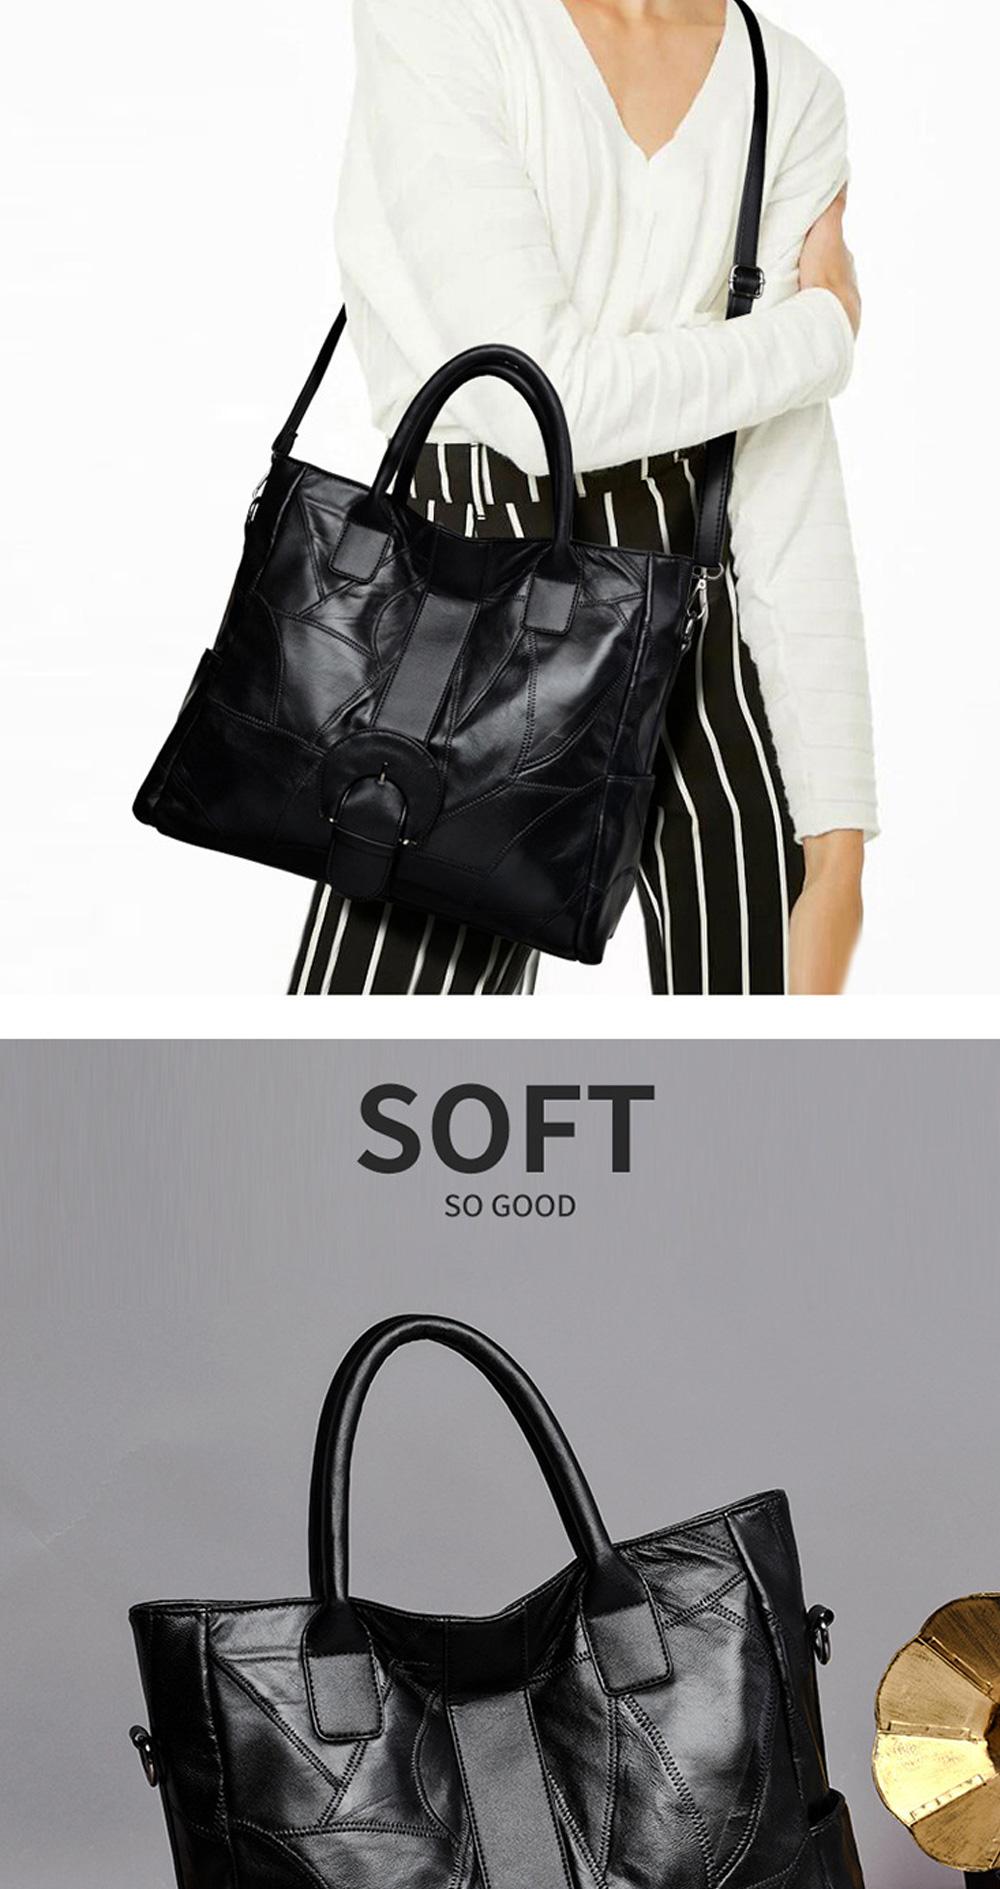 Genuine Leather Handbags Sheepskin Tote Bags, New Large-capacity Shoulder Handbags, Mommy bags Designed for women 33*10*31cm 3